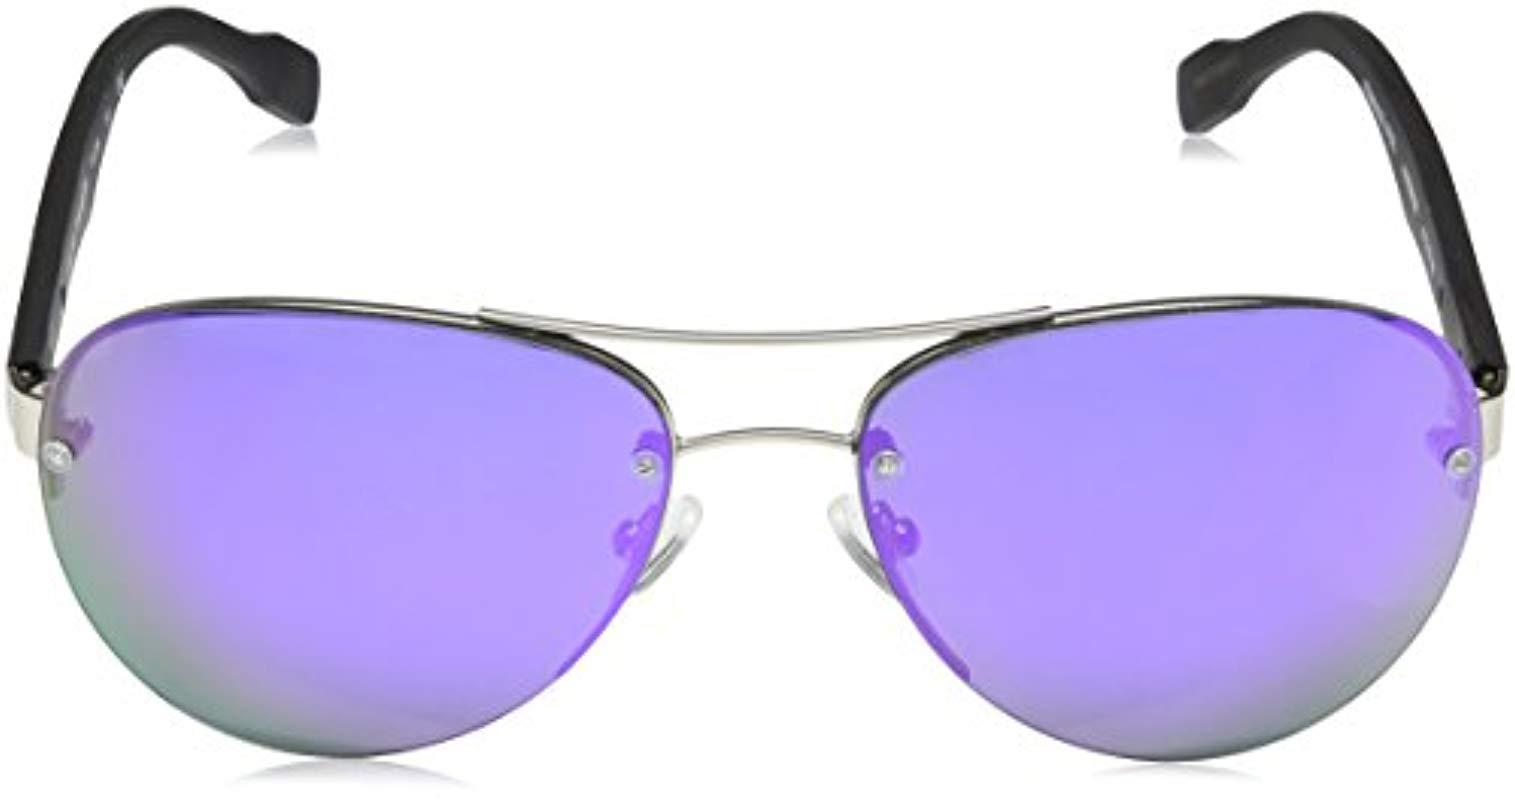 bc07f606789 Lyst - Elie Tahari El 206 Slv Aviator Sunglasses in Metallic - Save 75%